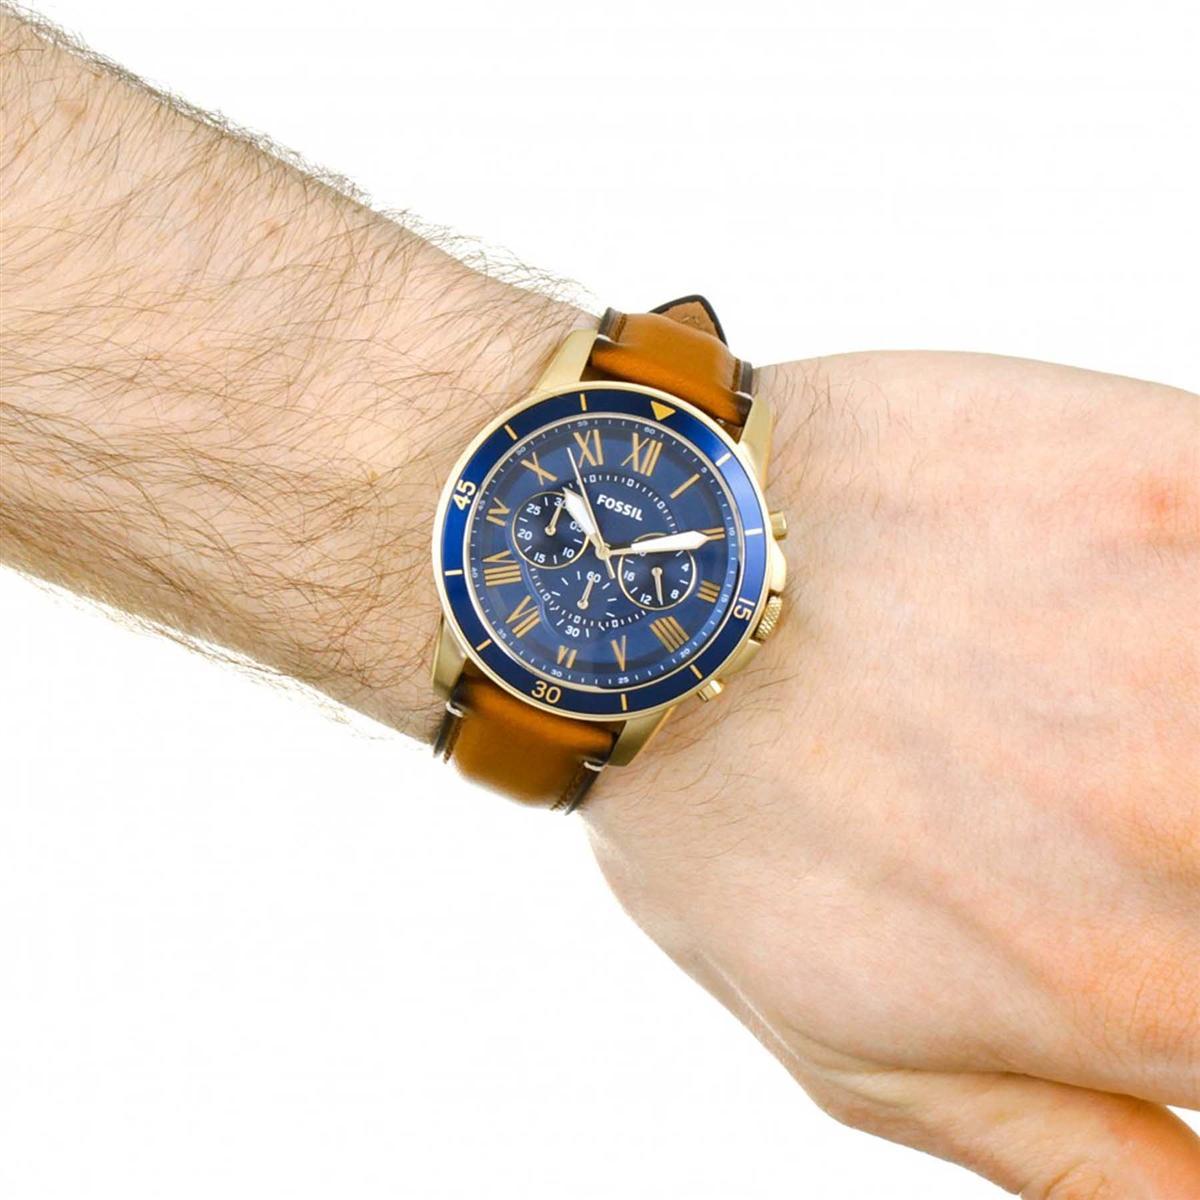 Relógio Fossil Grant Cronógrafo Analógico Masculino FS5268 2AN Produto não  disponível 468275f2a3